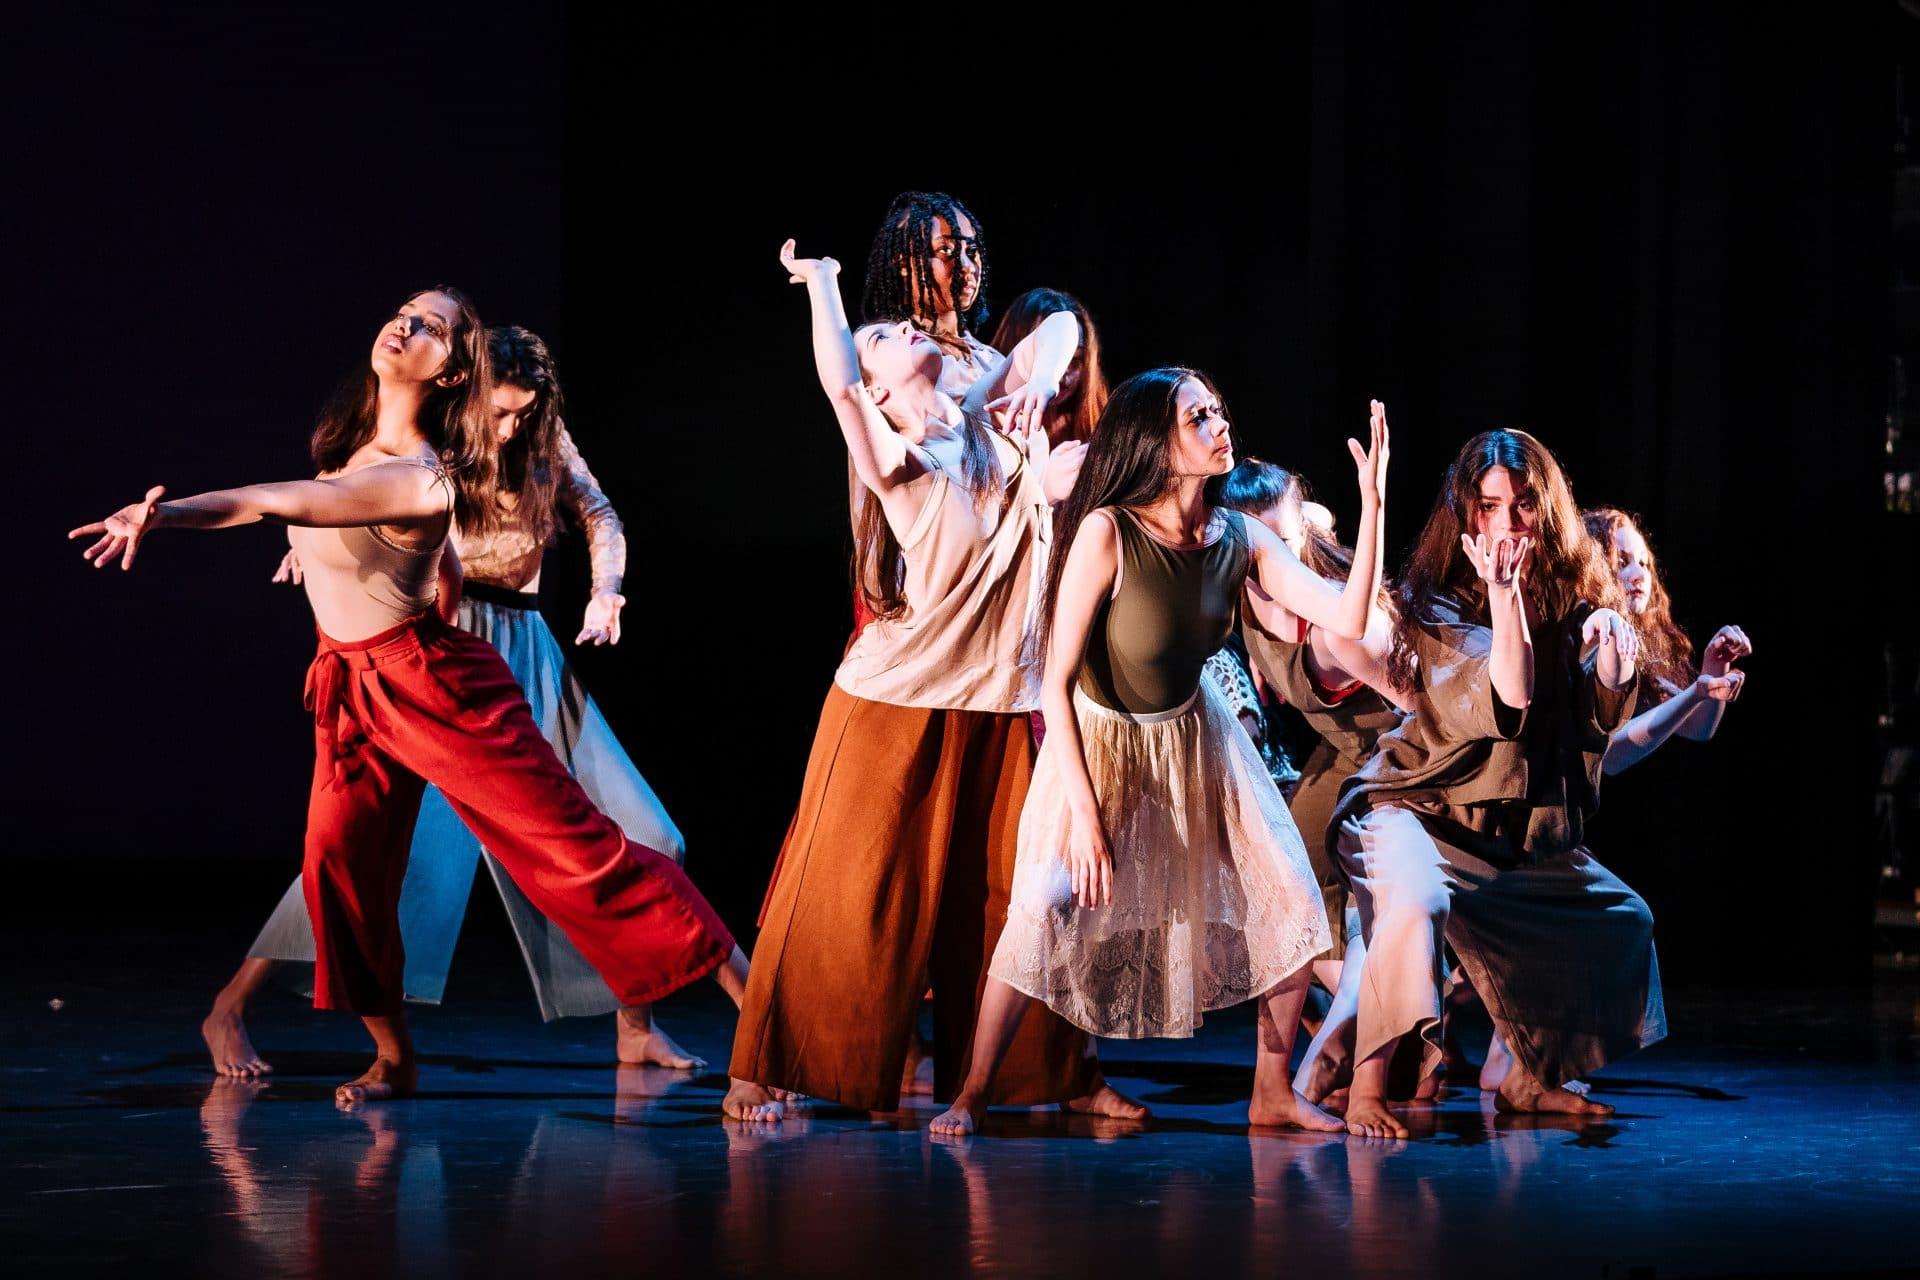 George Brown Dance Performances